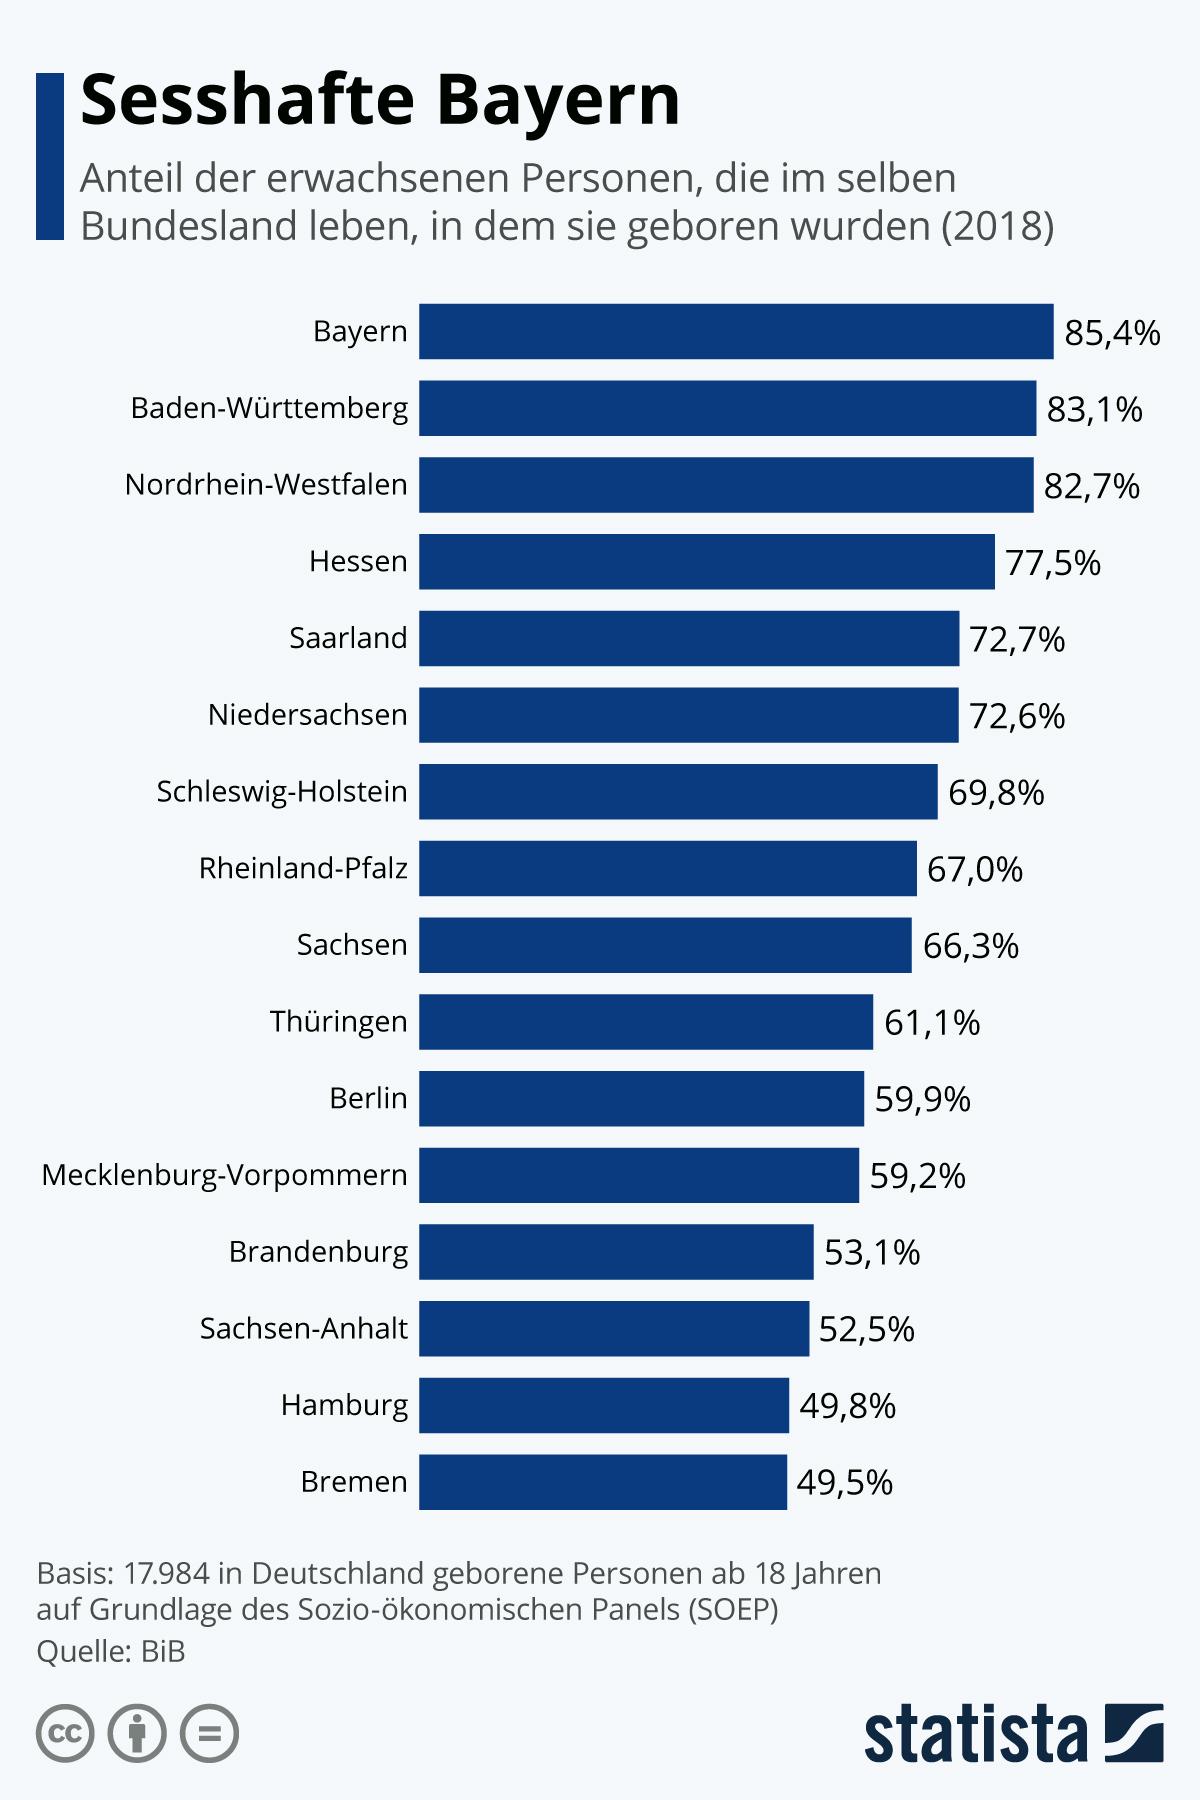 Infografik: Sesshafte Bayern | Statista